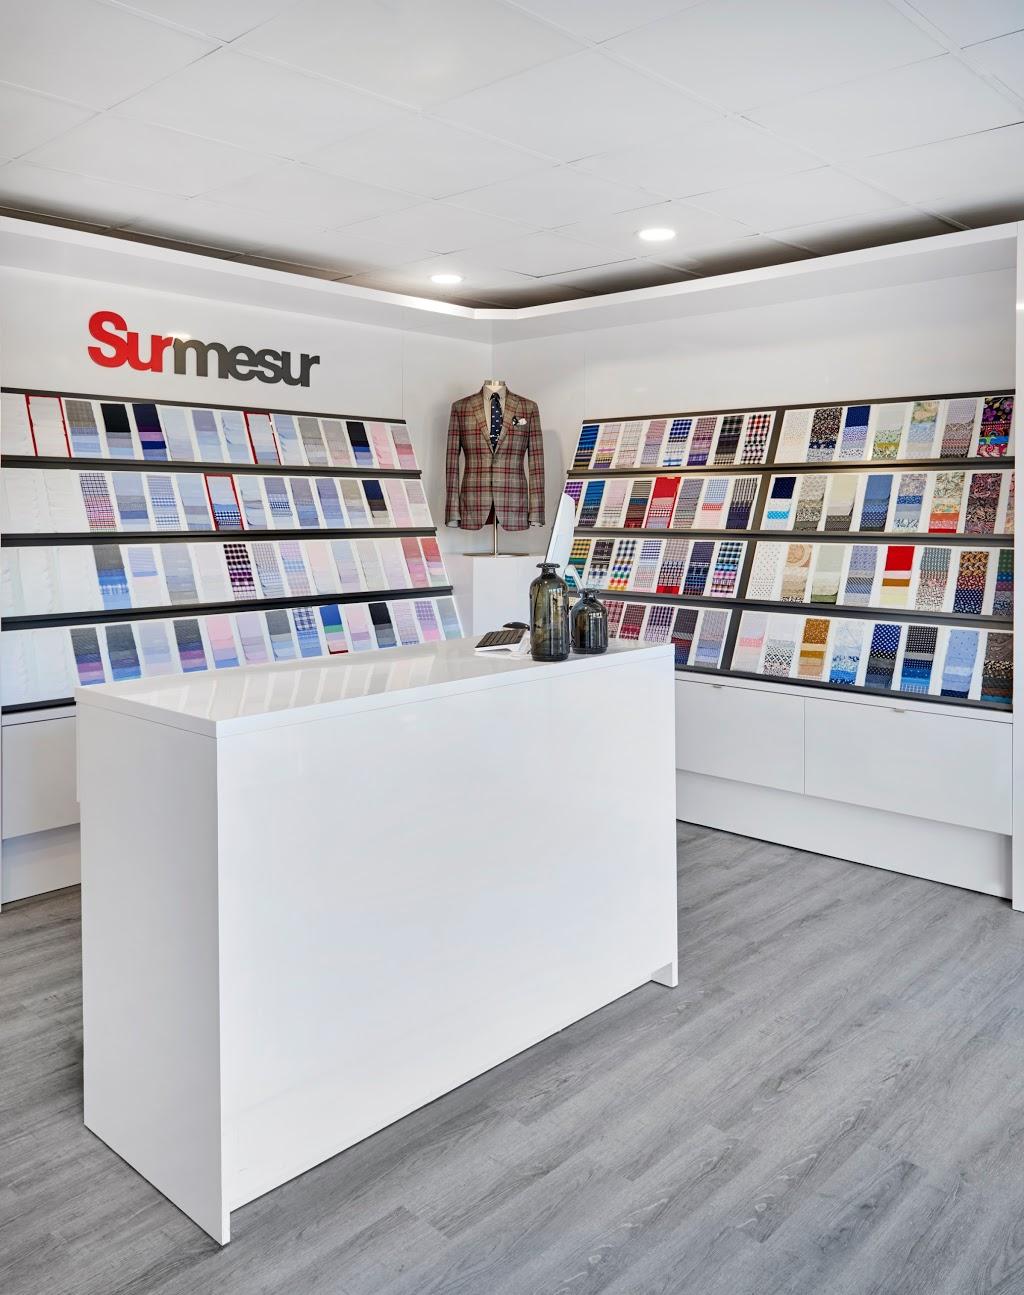 Surmesur Custom Menswear   clothing store   255 Lakeshore Rd E, Mississauga, ON L5G 1G8, Canada   2897241995 OR +1 289-724-1995